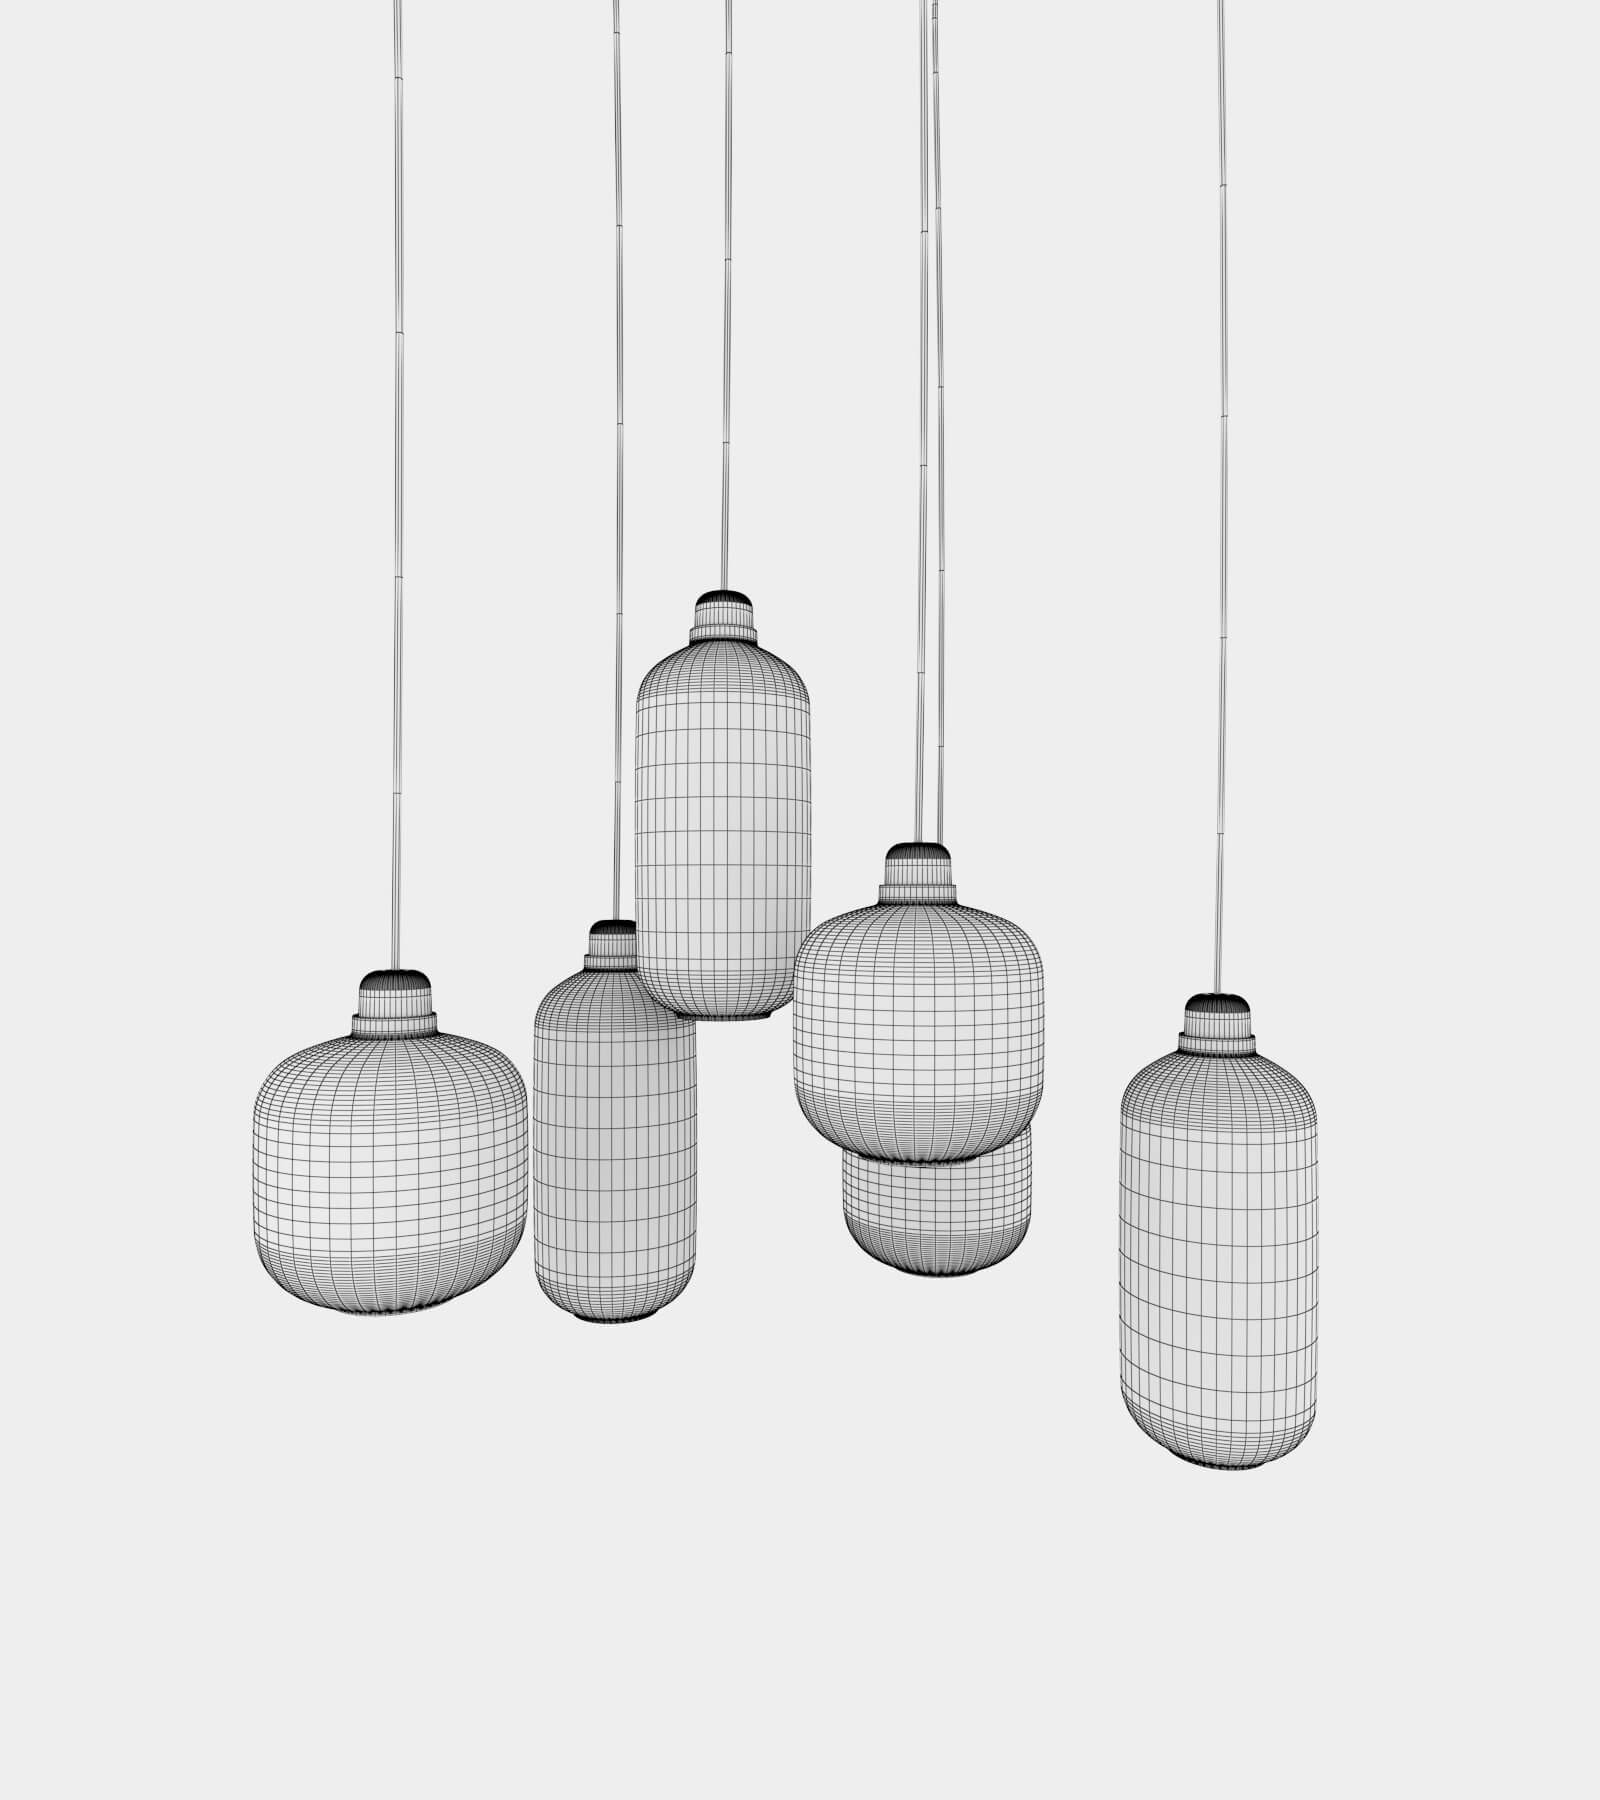 Retro round ceiling lamp set-wire-1 3D Model